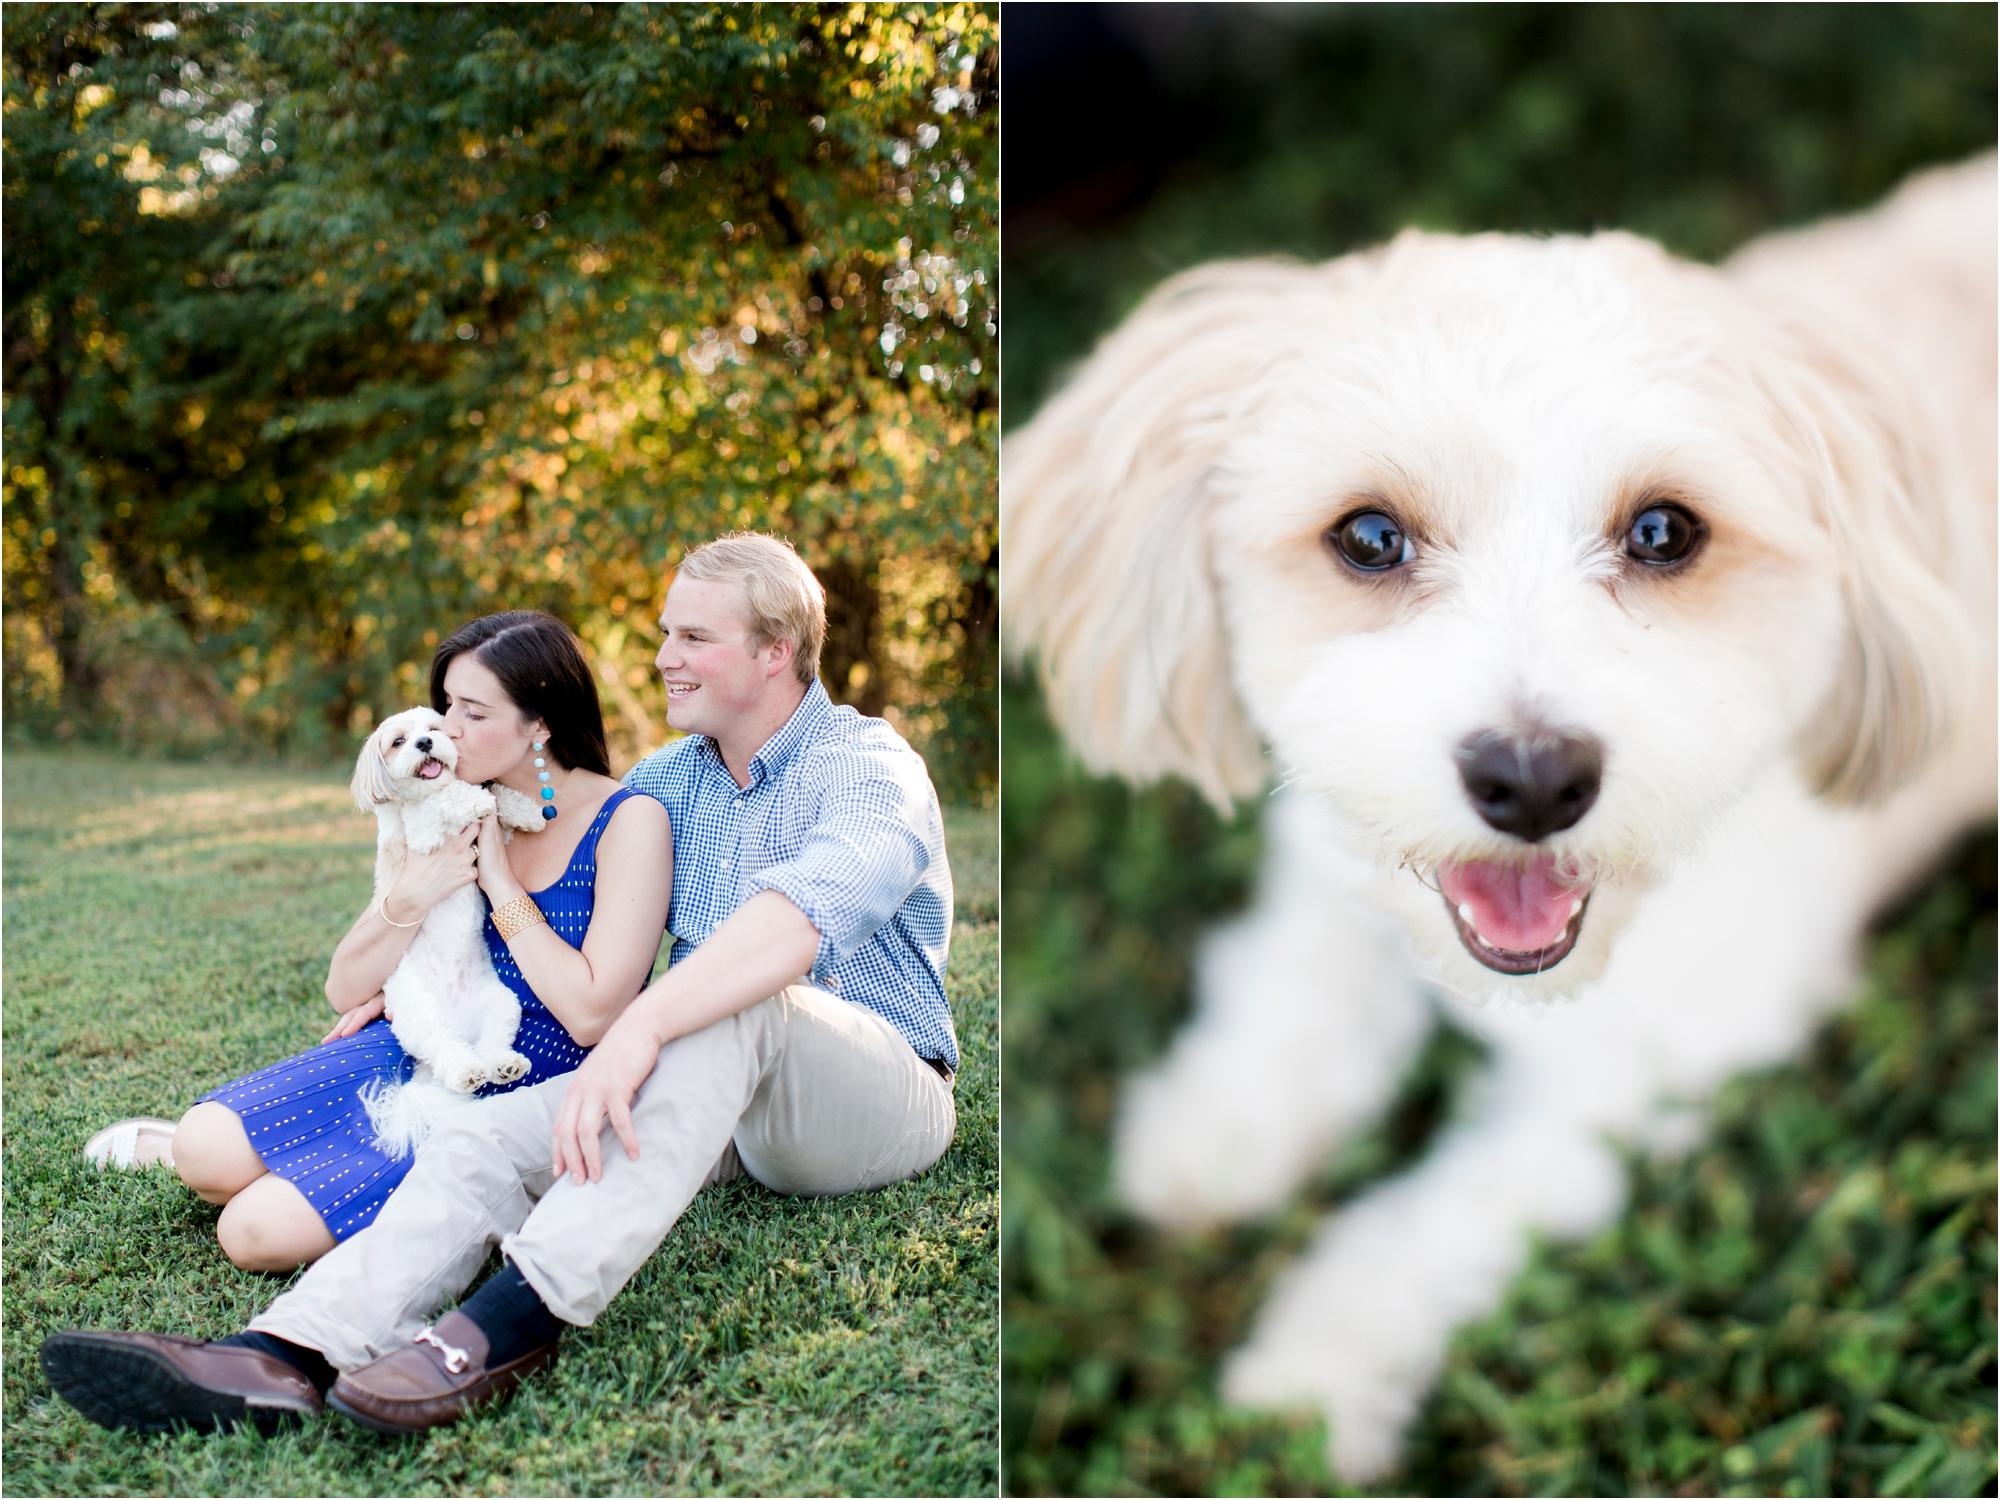 claire-thomas-puppy-finn-james-river-richmond-virginia-enagement-session_0002.jpg